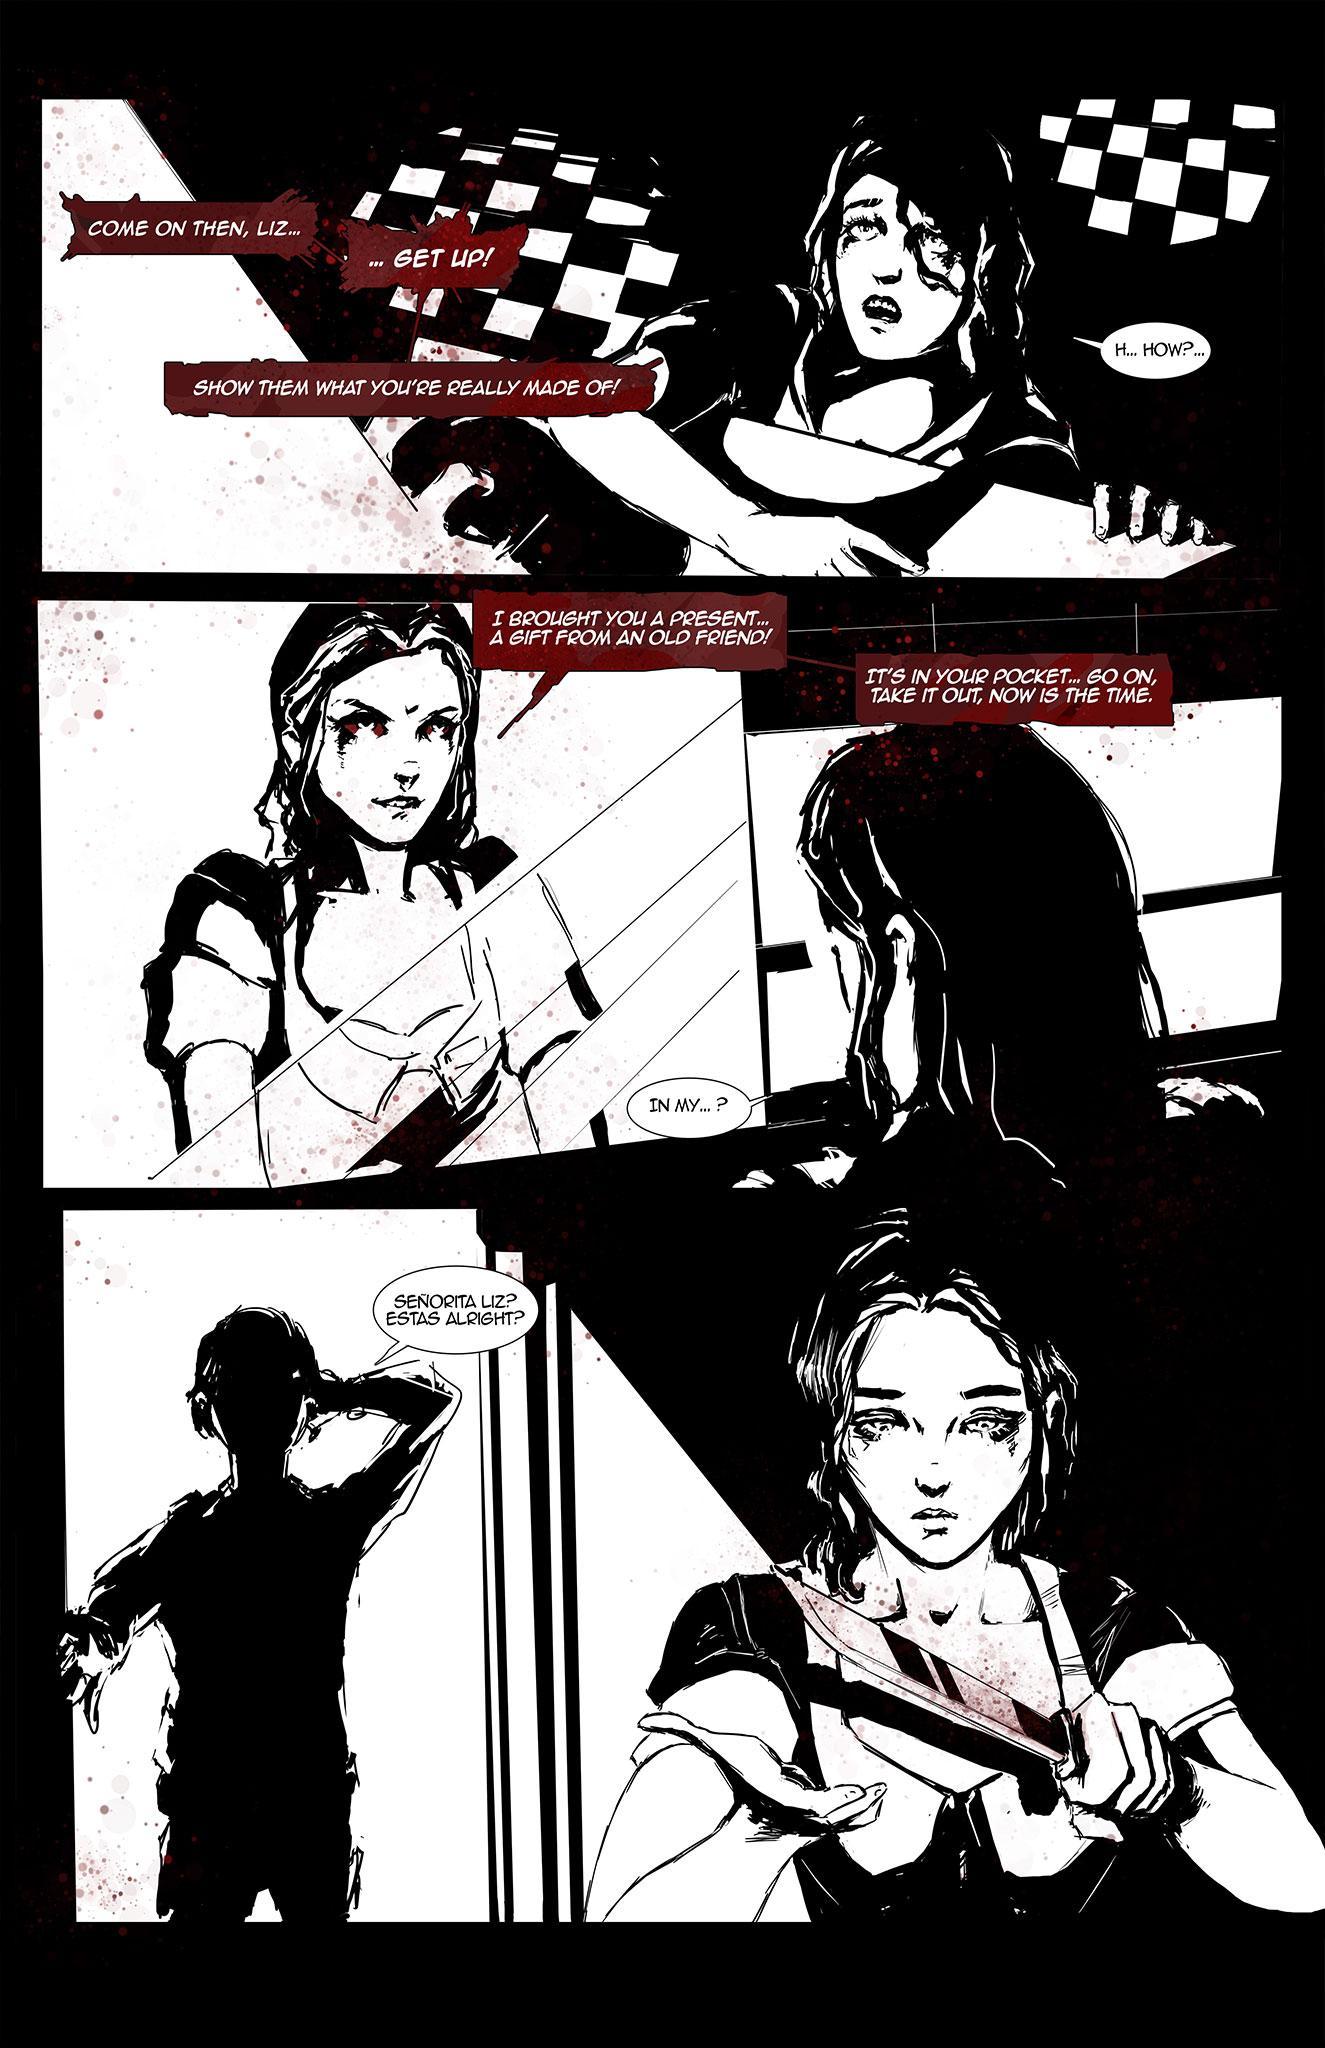 Liz_page3